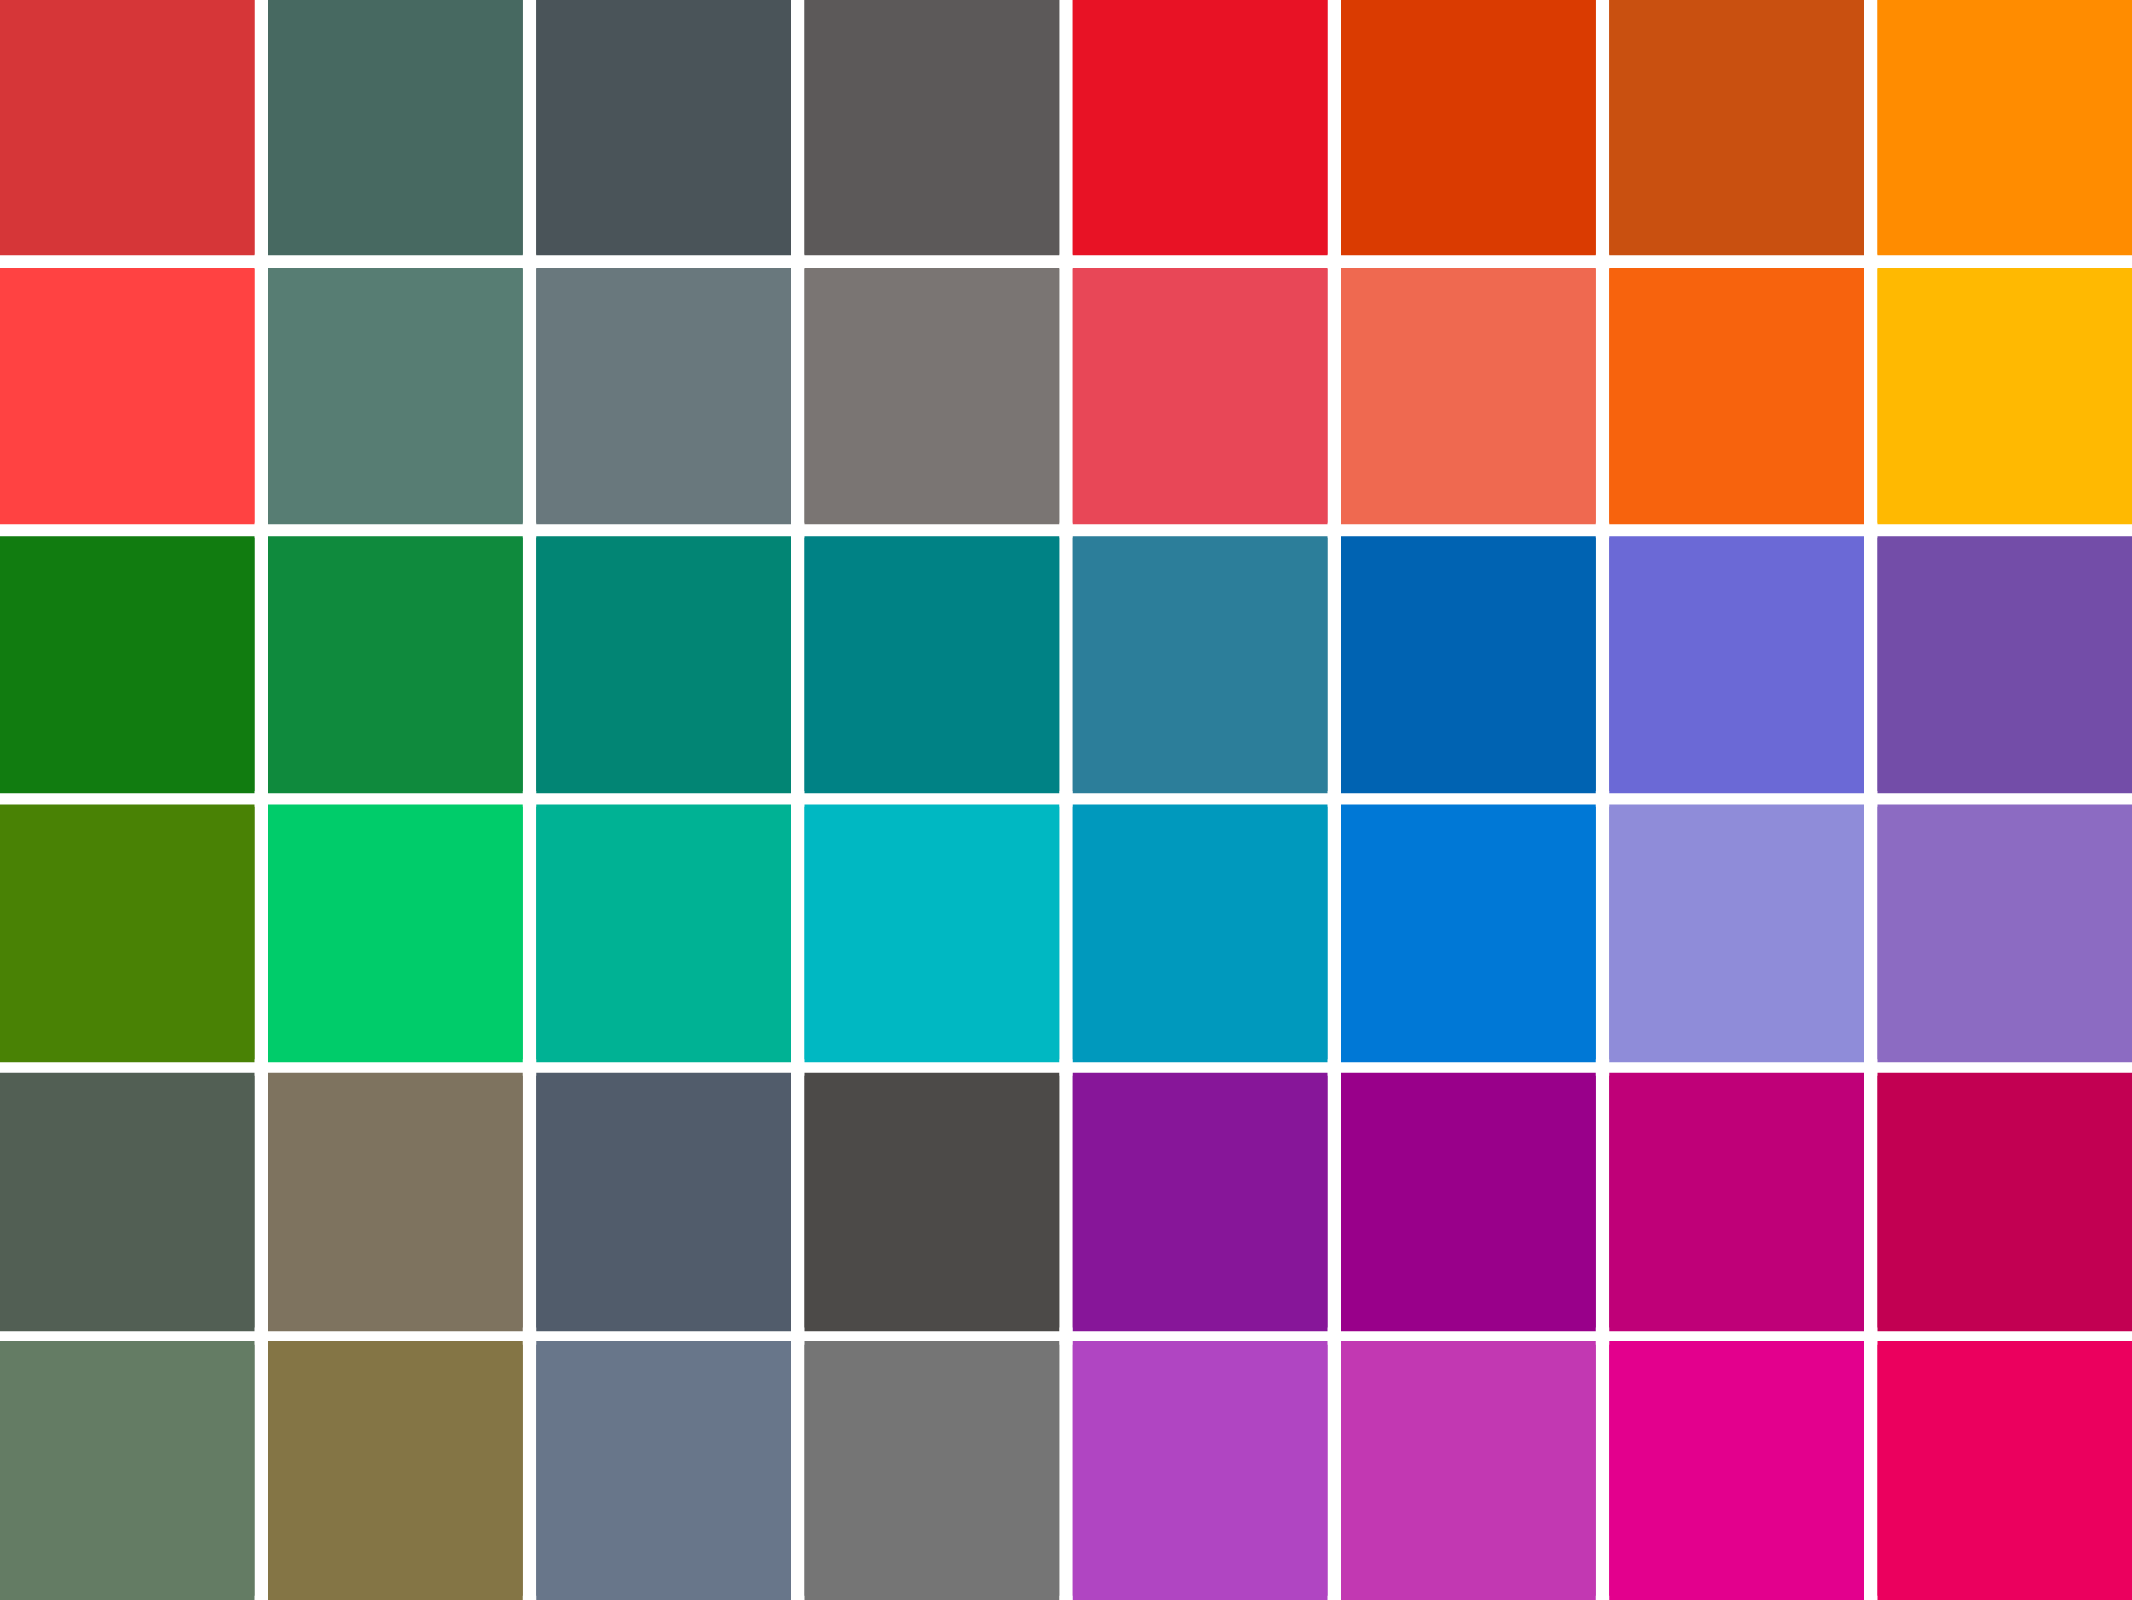 raykovich_start_Artboard 120